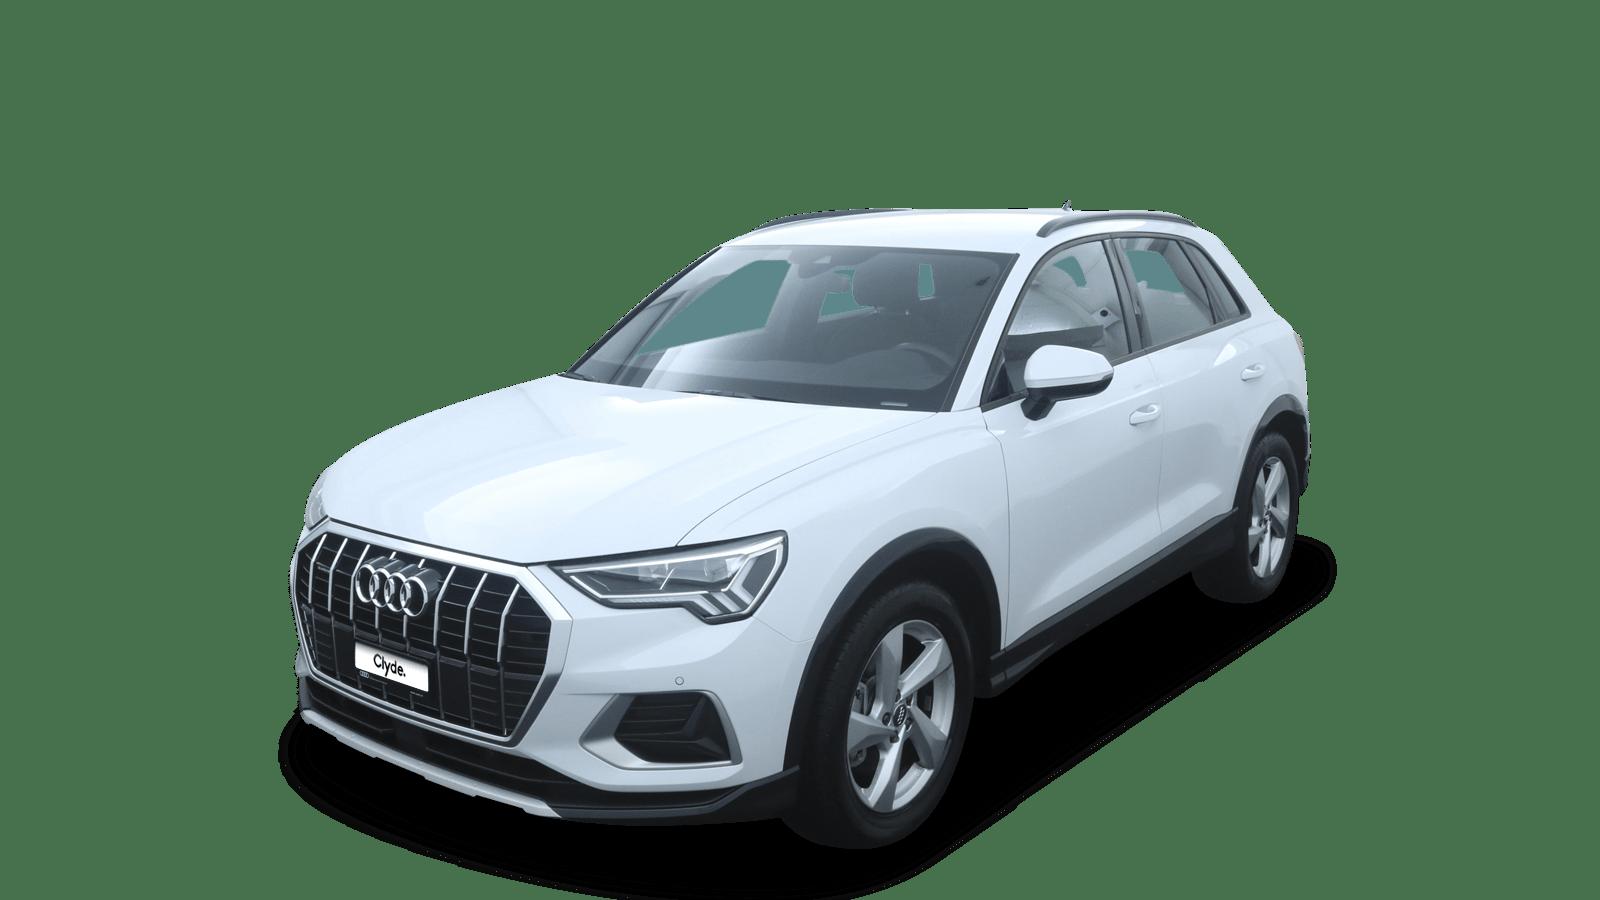 Audi Q3 White front - Clyde car subscription